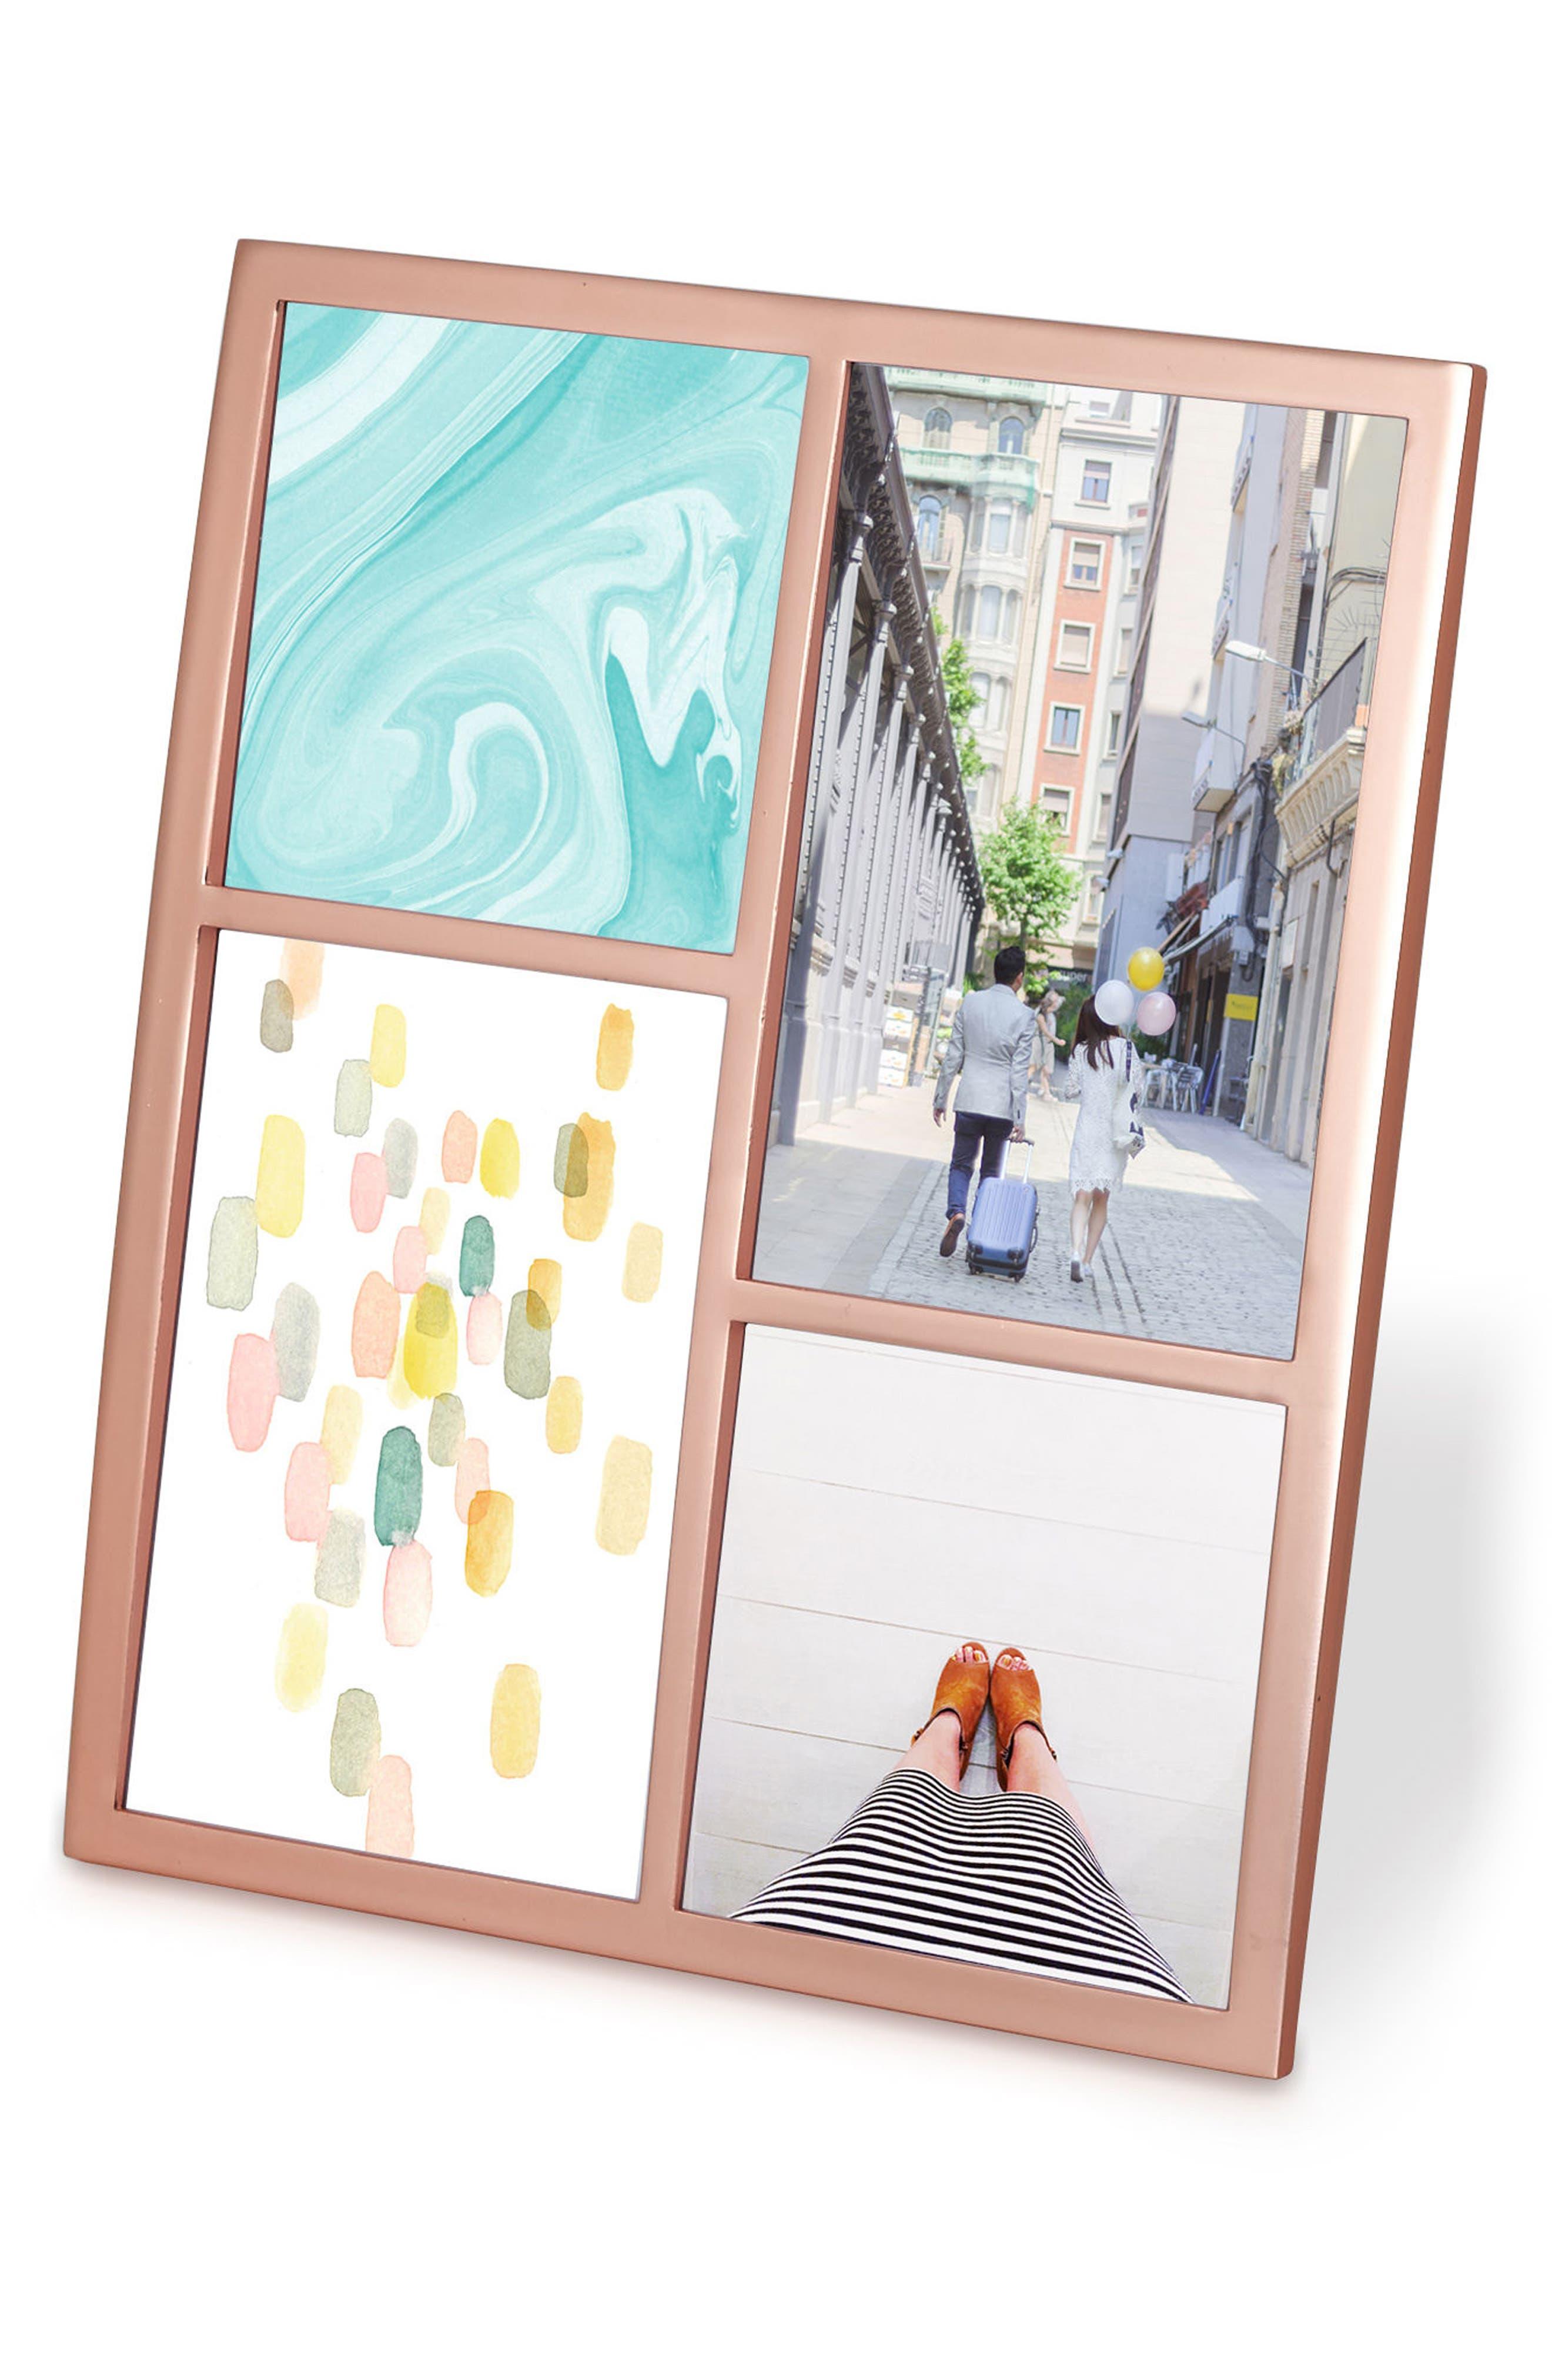 Umbra Senza Multi Display Picture Frame